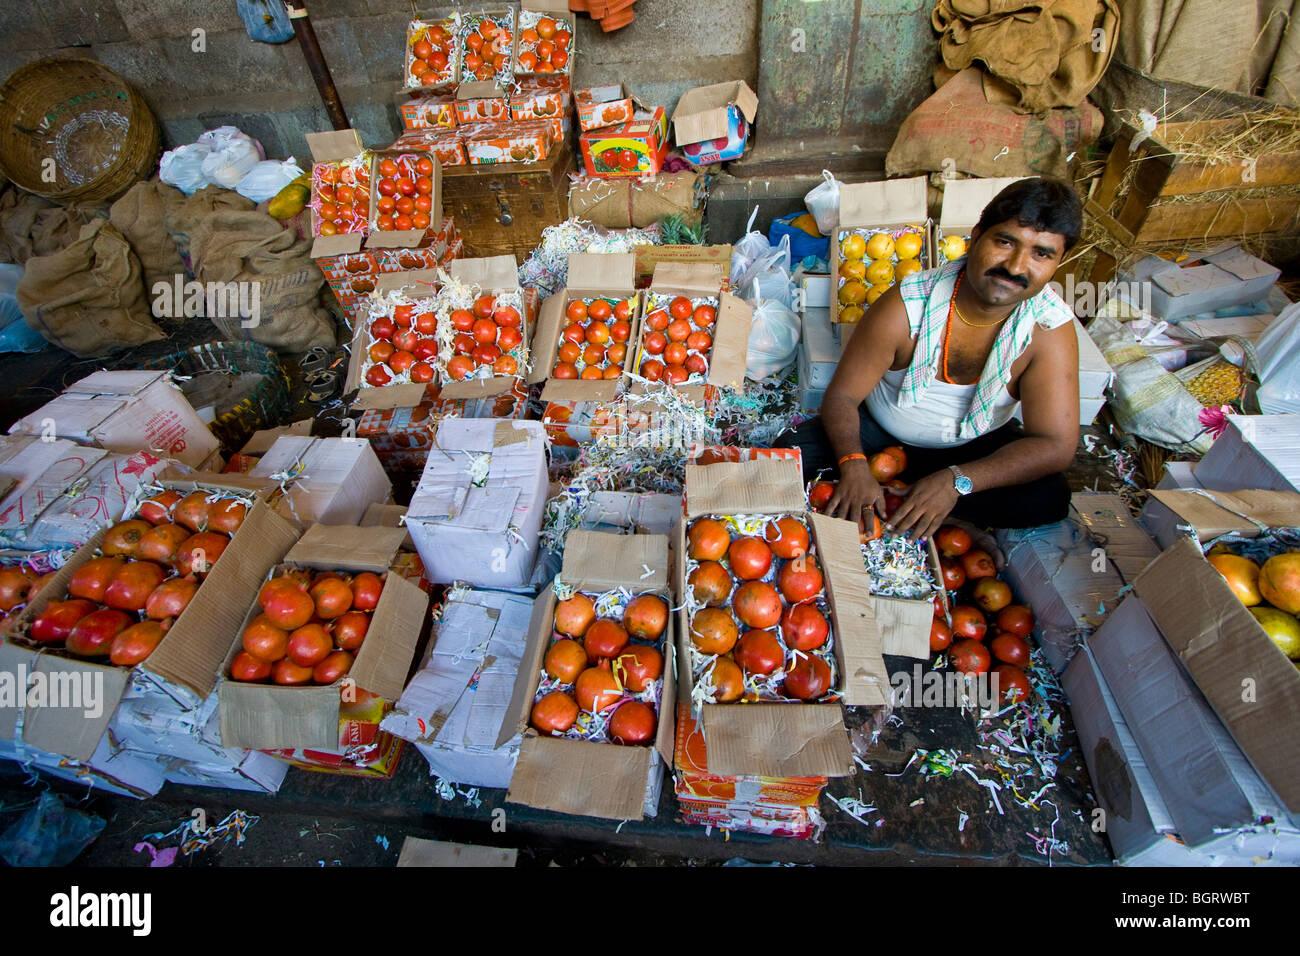 Pomegranate Vendor at Crawford Market in Mumbai India - Stock Image